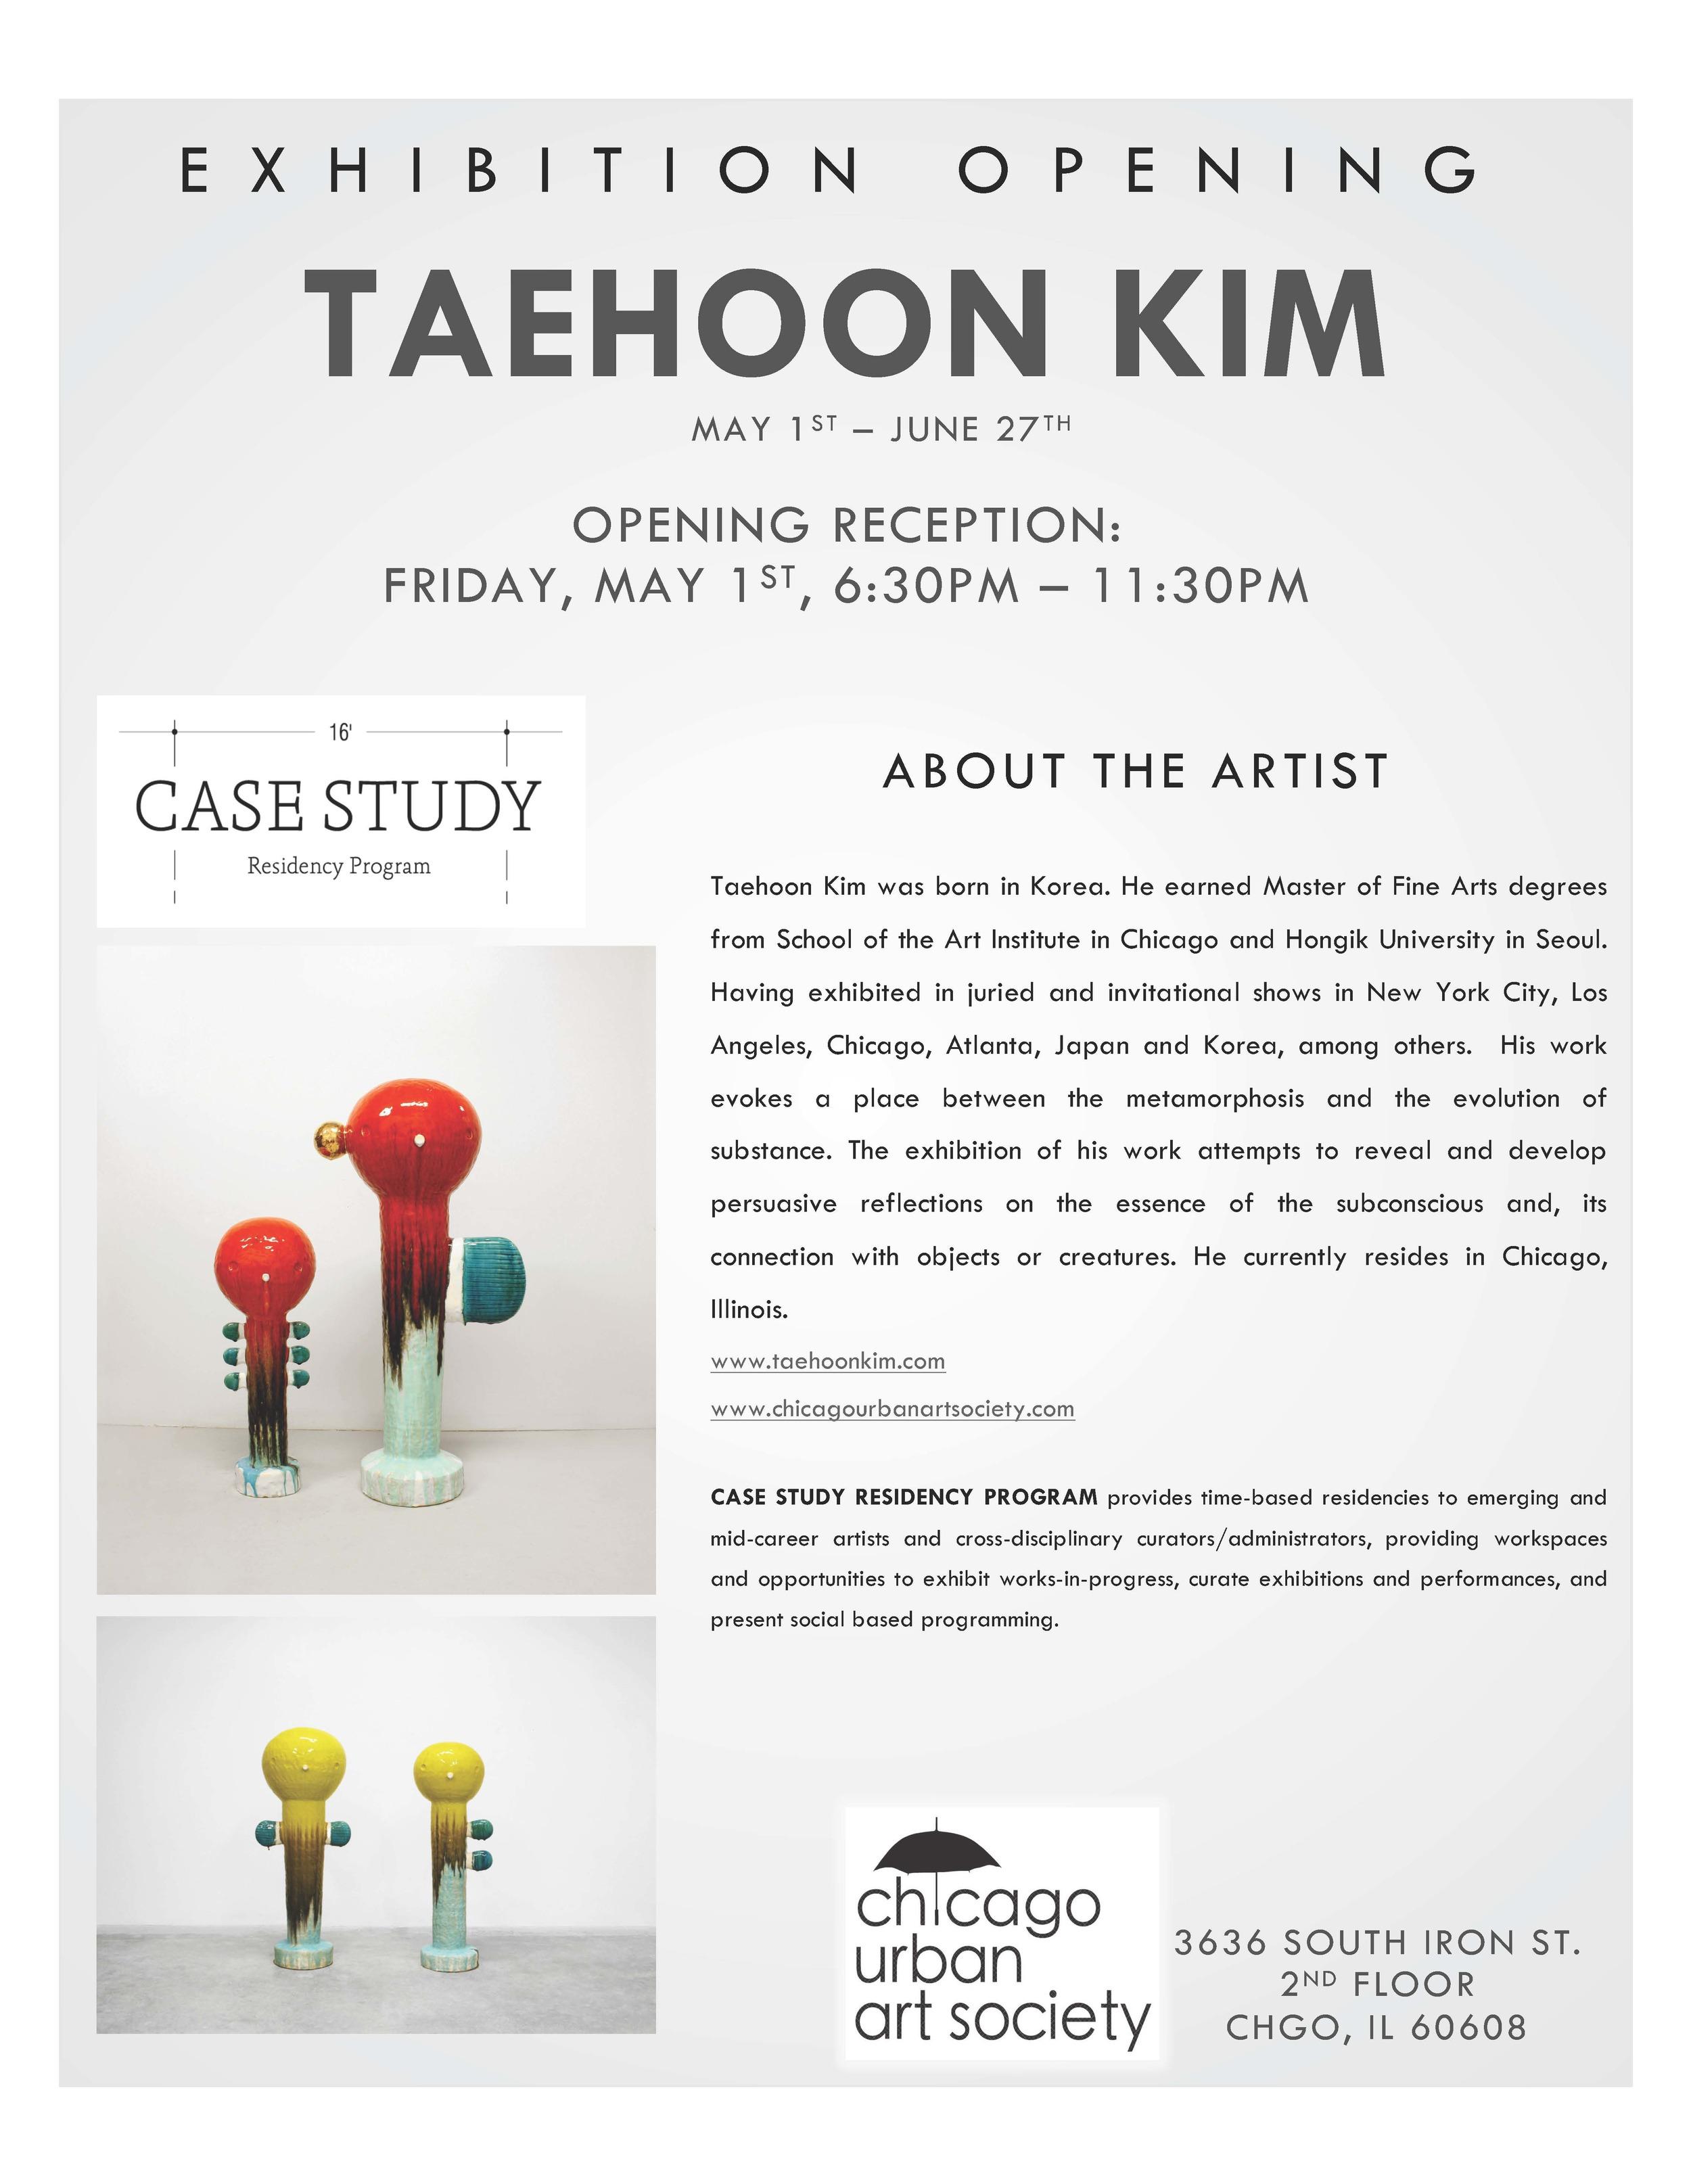 TAEHOON KIM CASE STUDY EXHIBIT OPENING MAY 1ST.jpg